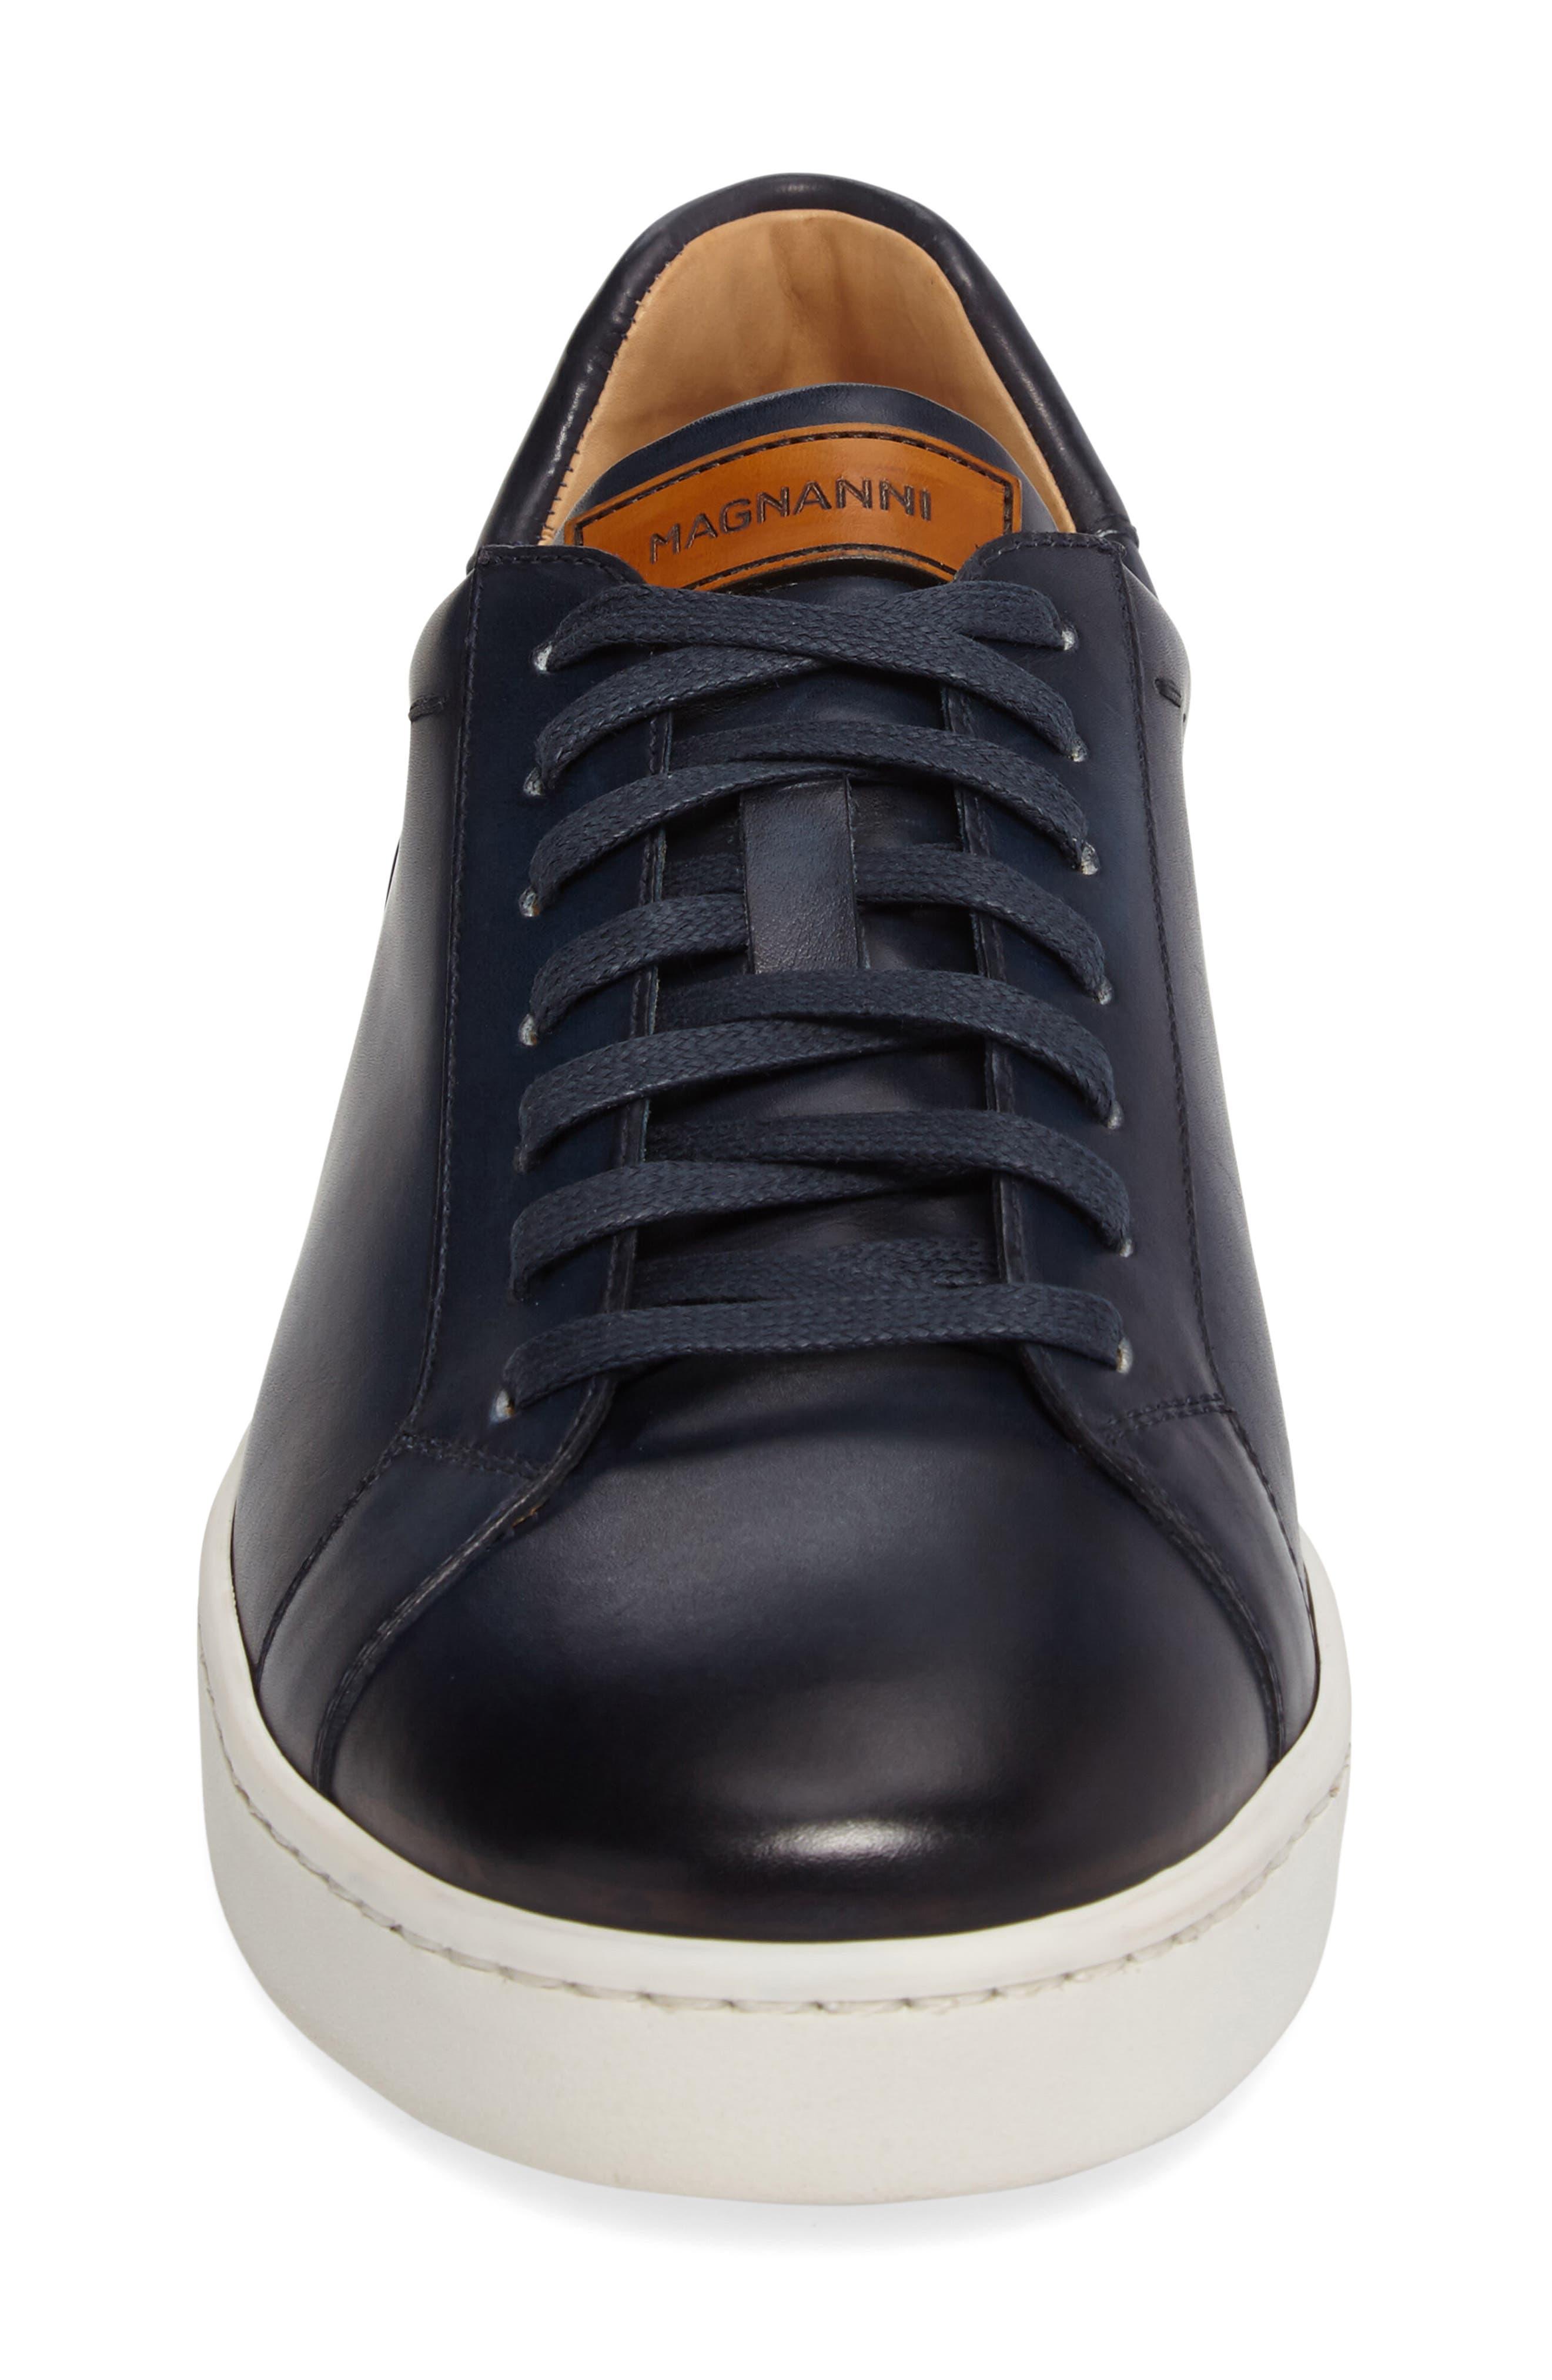 Alternate Image 4  - Magnanni Caballero Sneaker (Men)